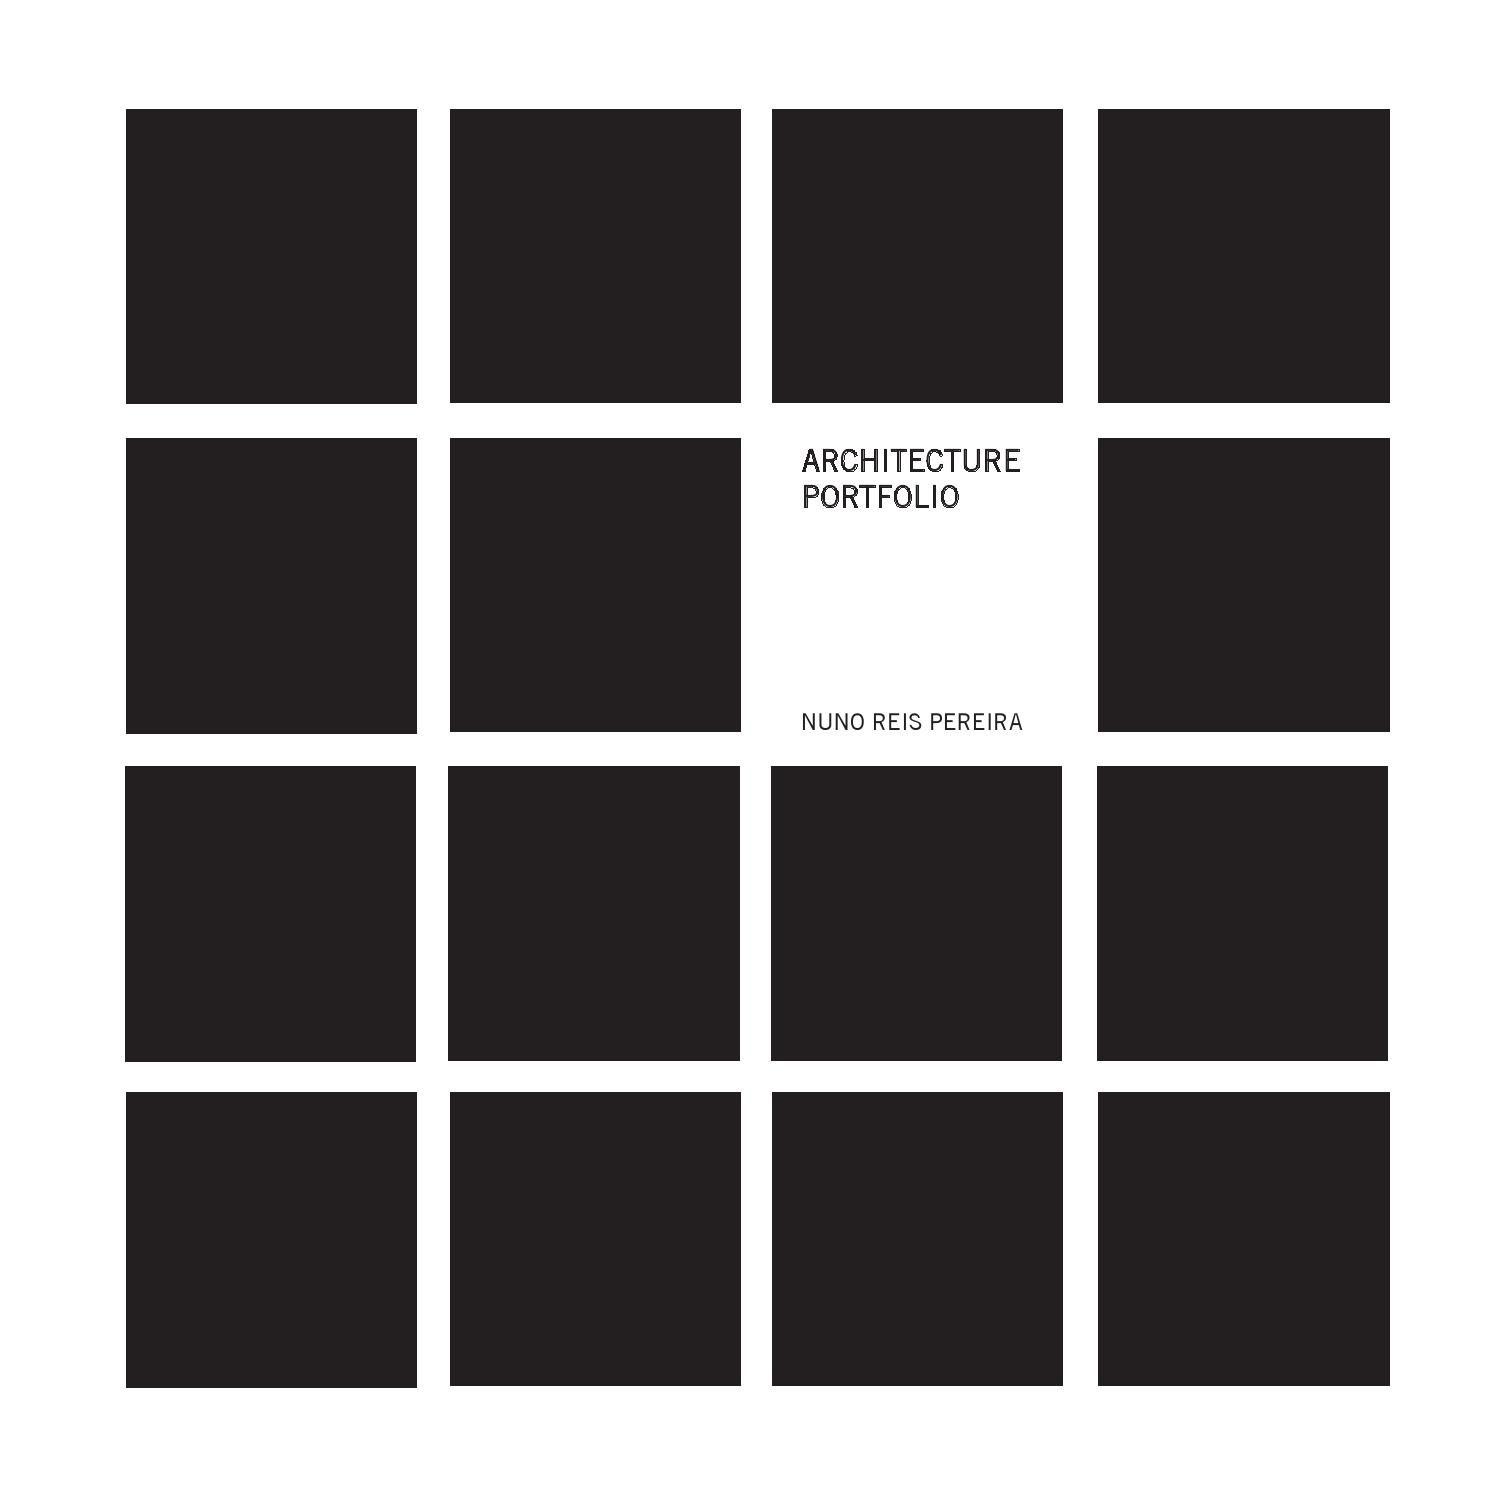 shannyn grandlienard interior design portfolio student architecture portfolio collection of works nuno reis pereira